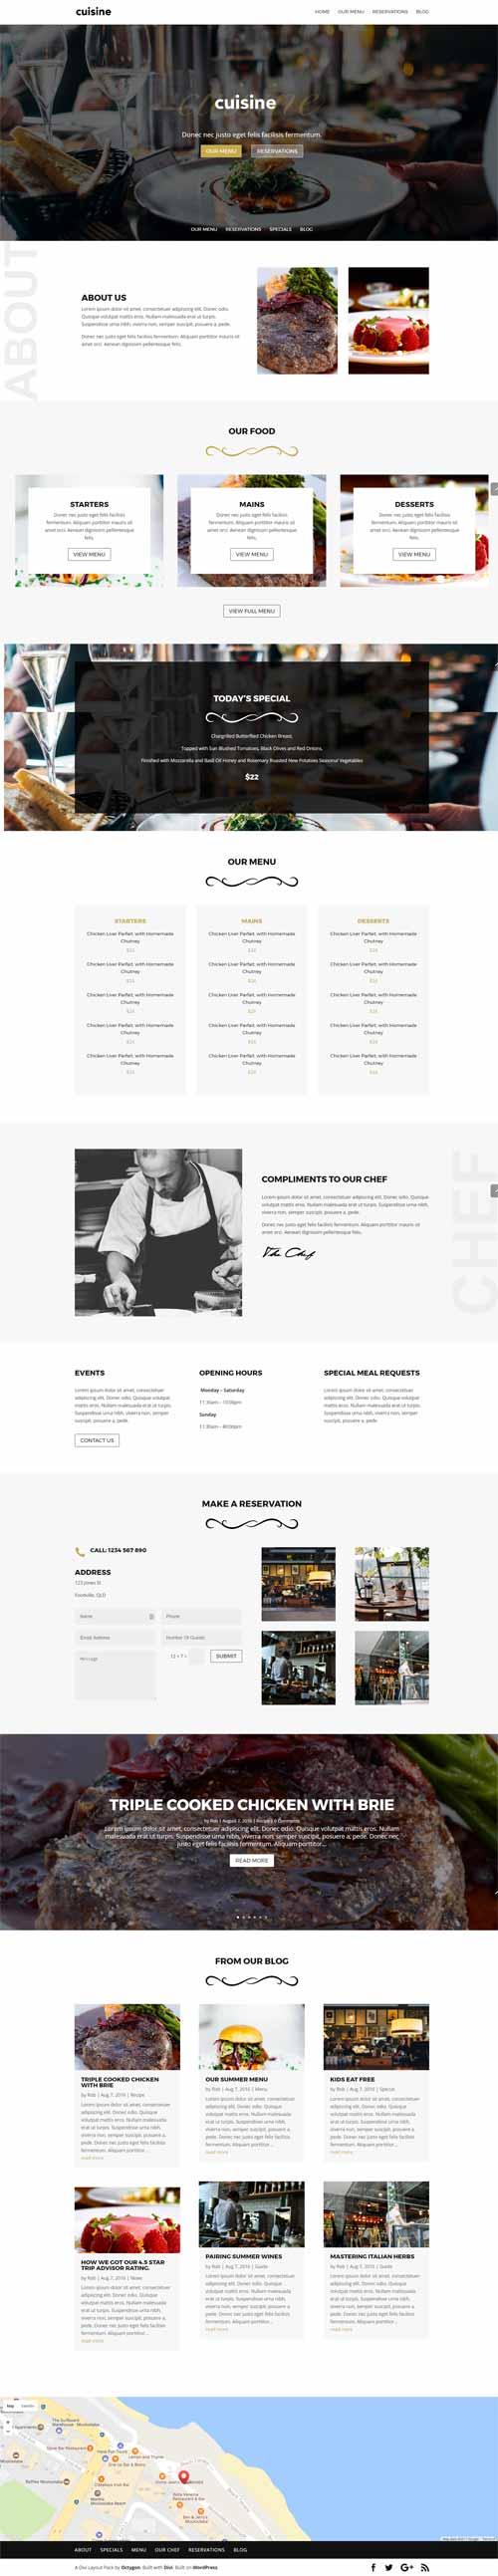 cuisine 1 page restaurant layout